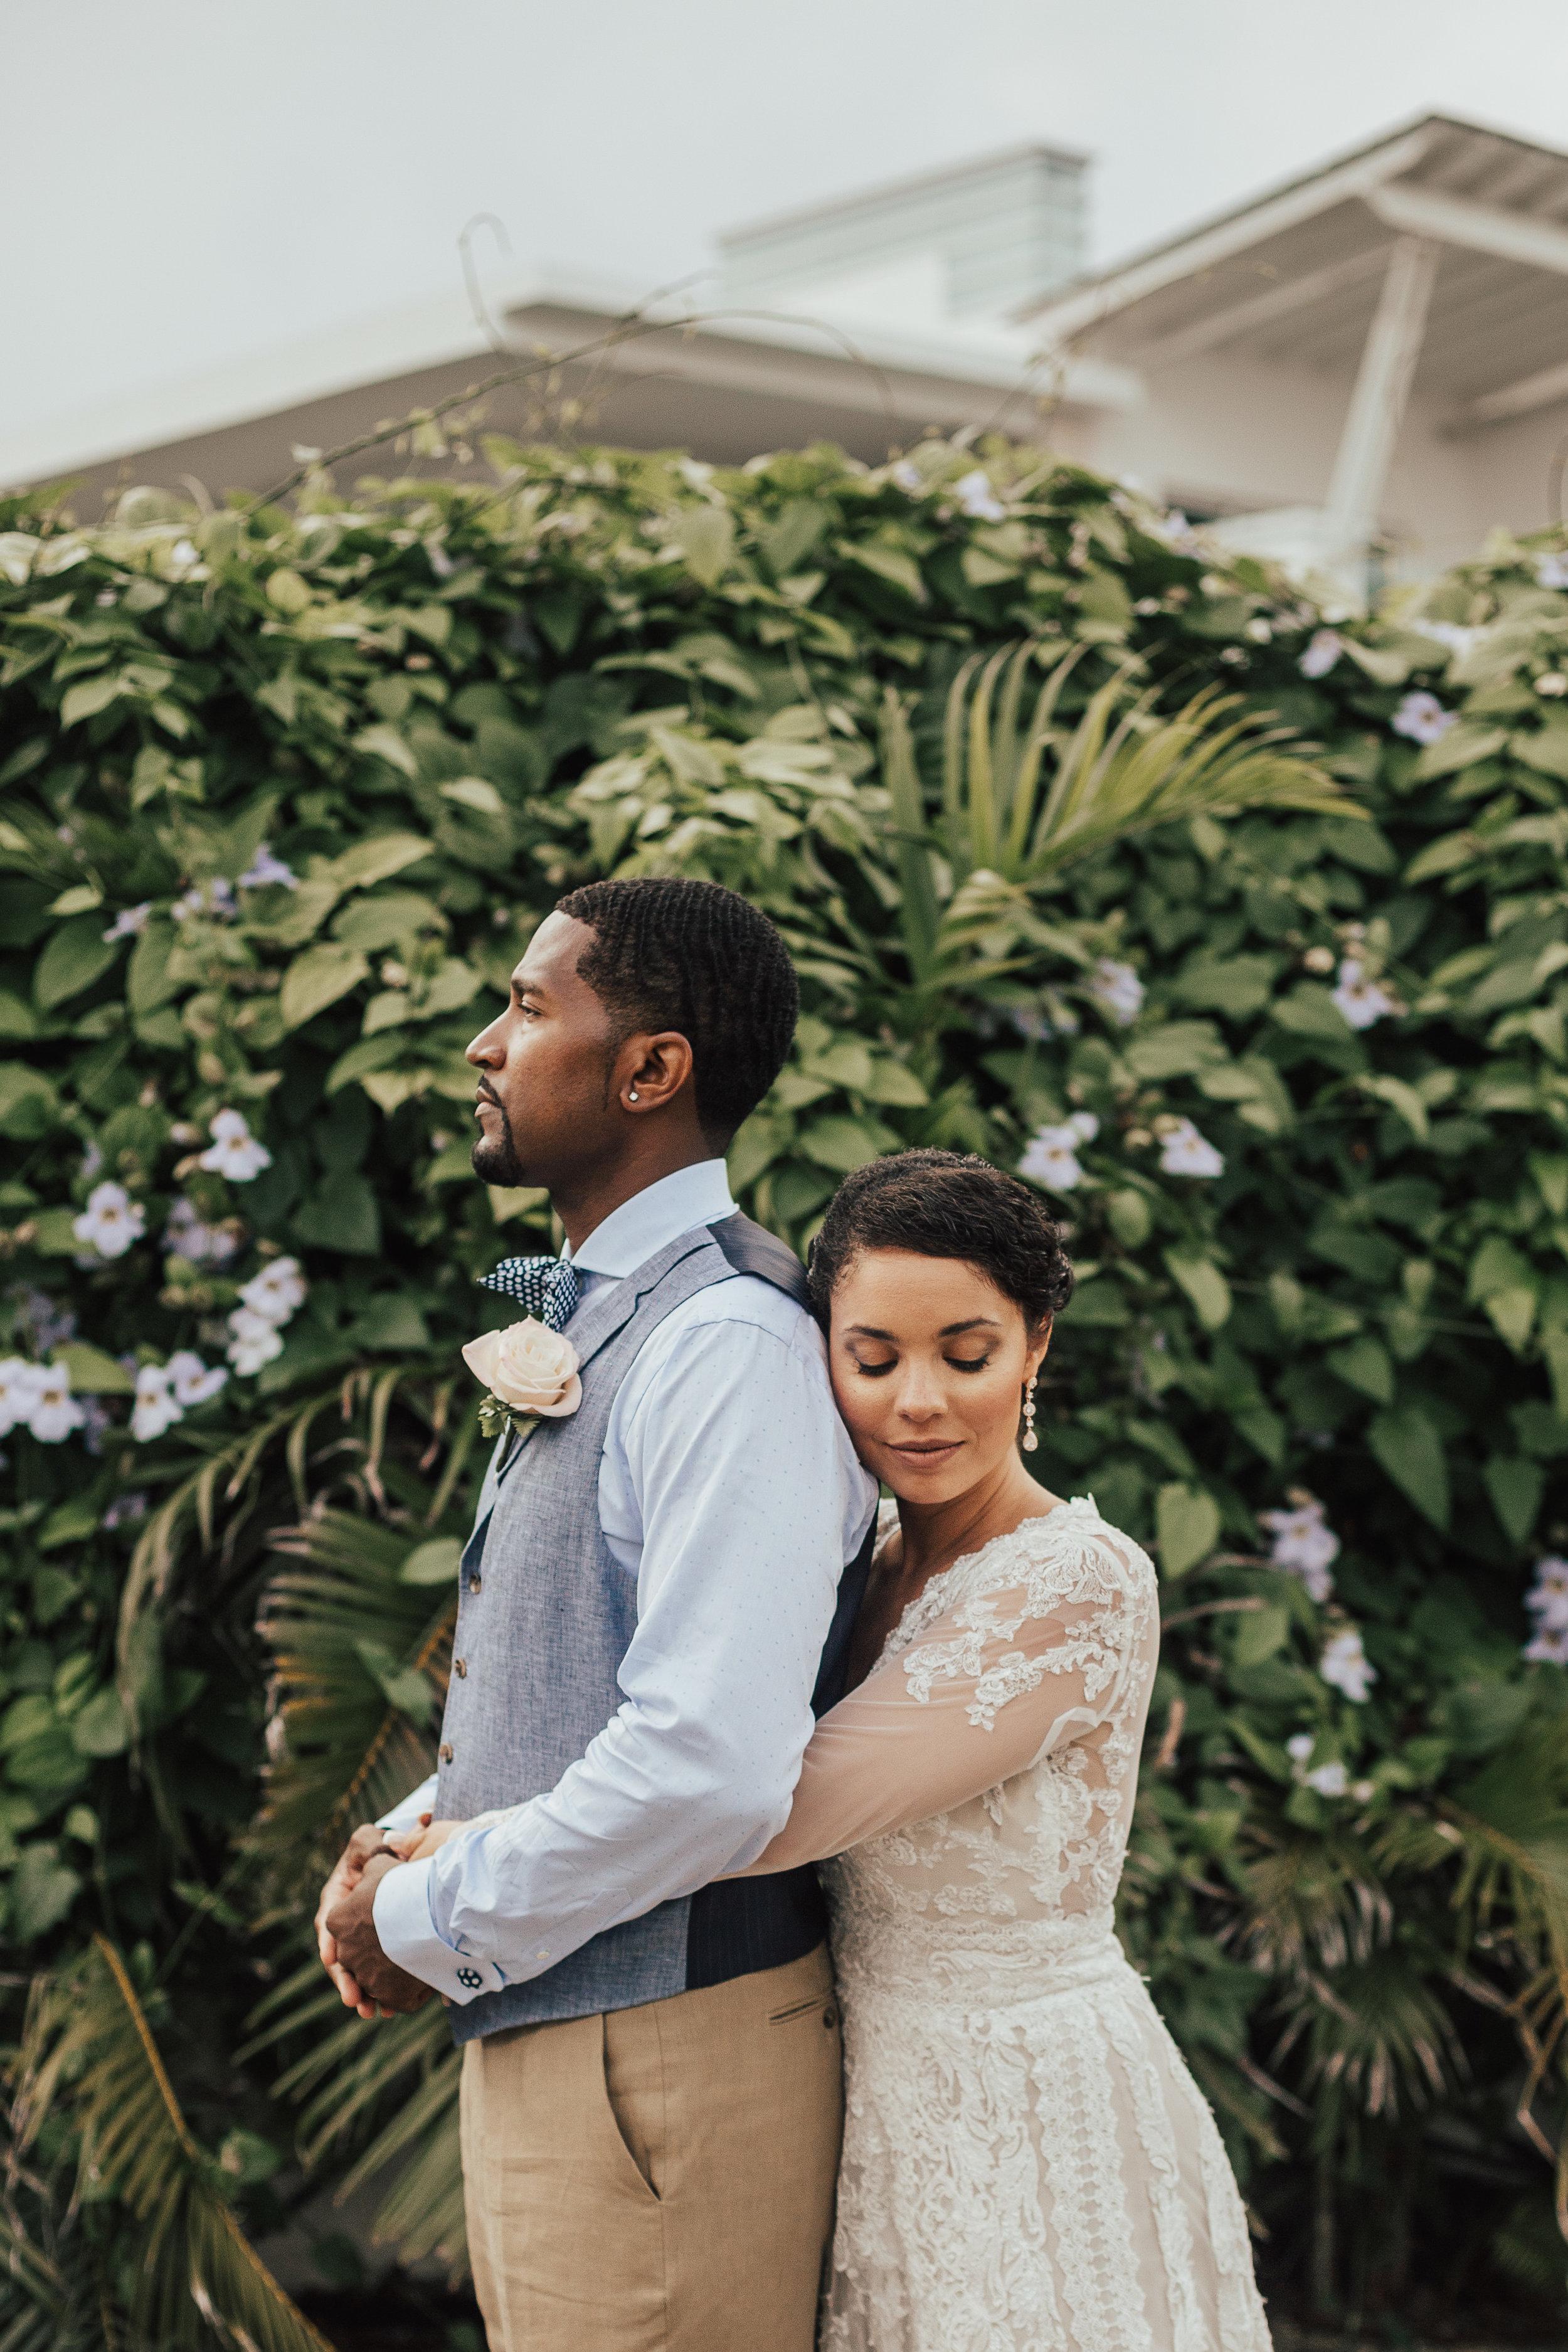 Destination-Wedding-Photographer-cleveland-wedding-photographer-elopement-photographer-elope-bali